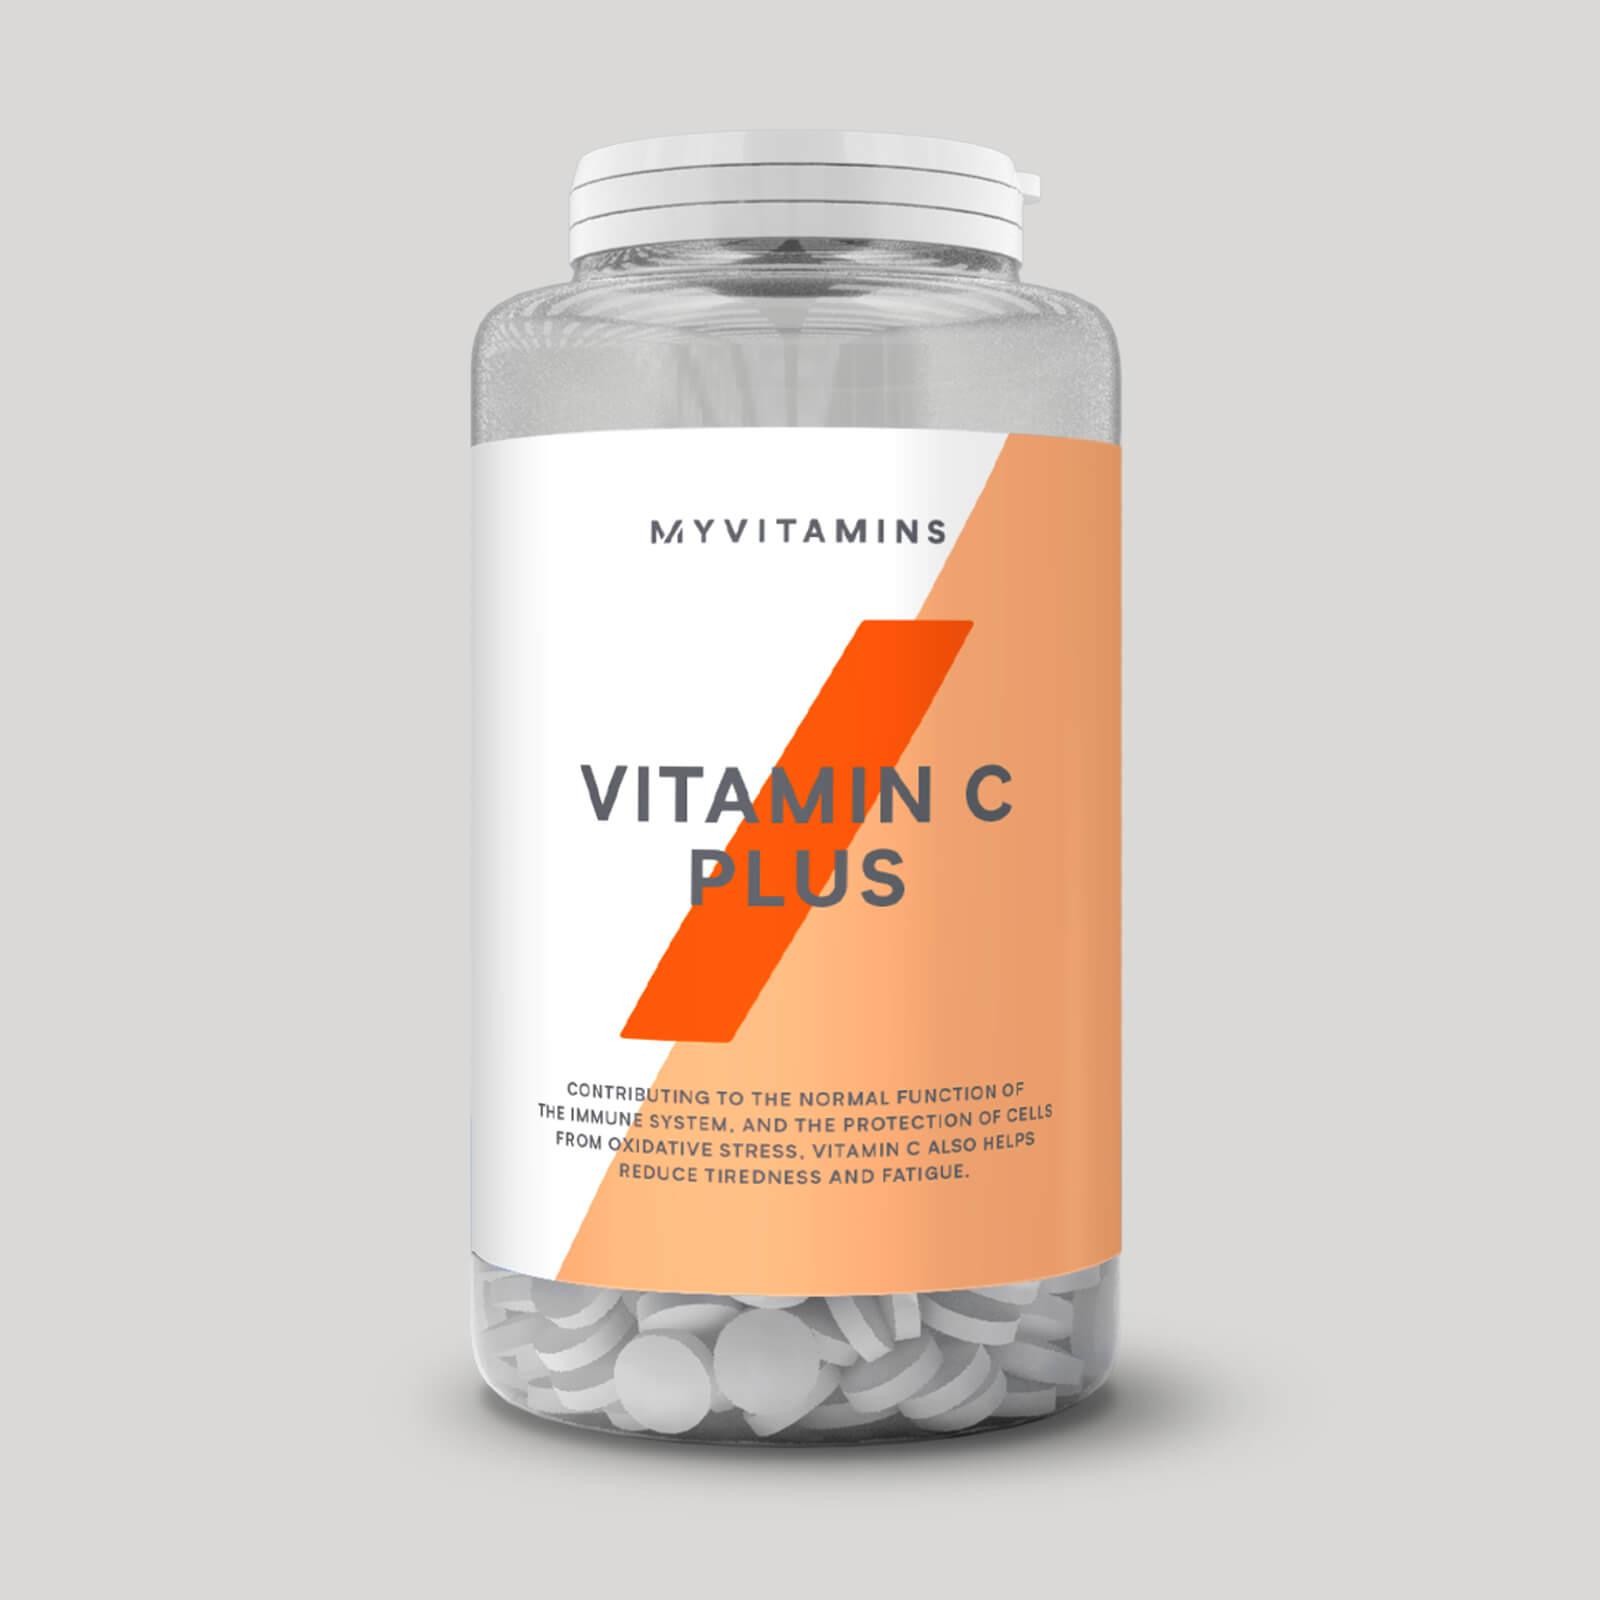 MyProtein Vitamin C with Bioflavonoids & Rosehip - 60Tablets - Pot